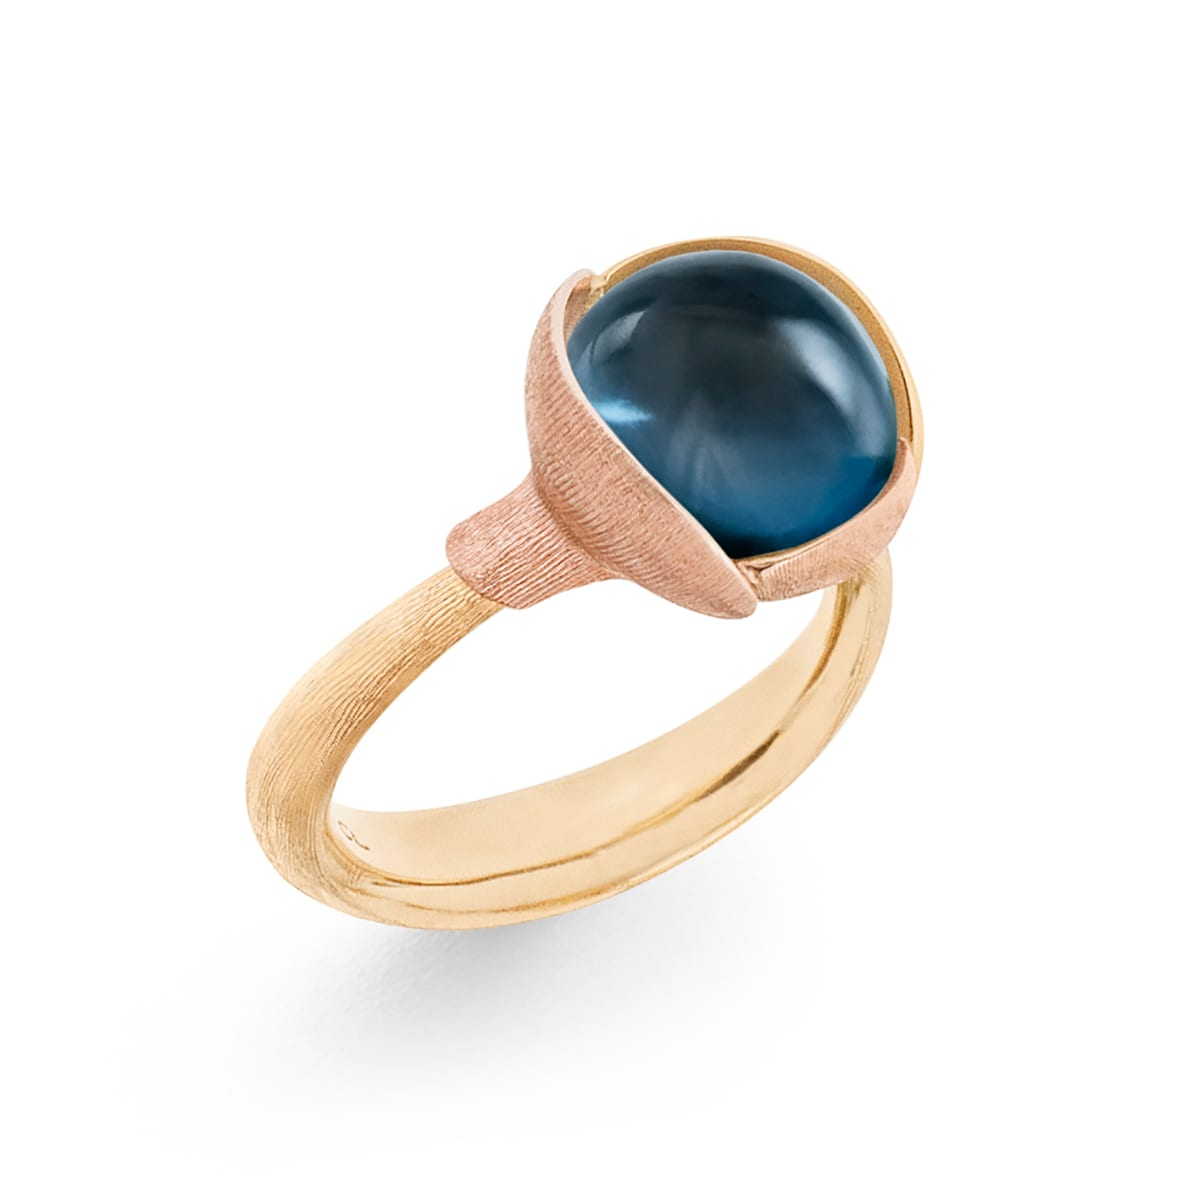 Ole_Lynggaard_Lotus_Ring 2_London Blue Topaz_A2651-423_V2_hos_Jarl_Sandin